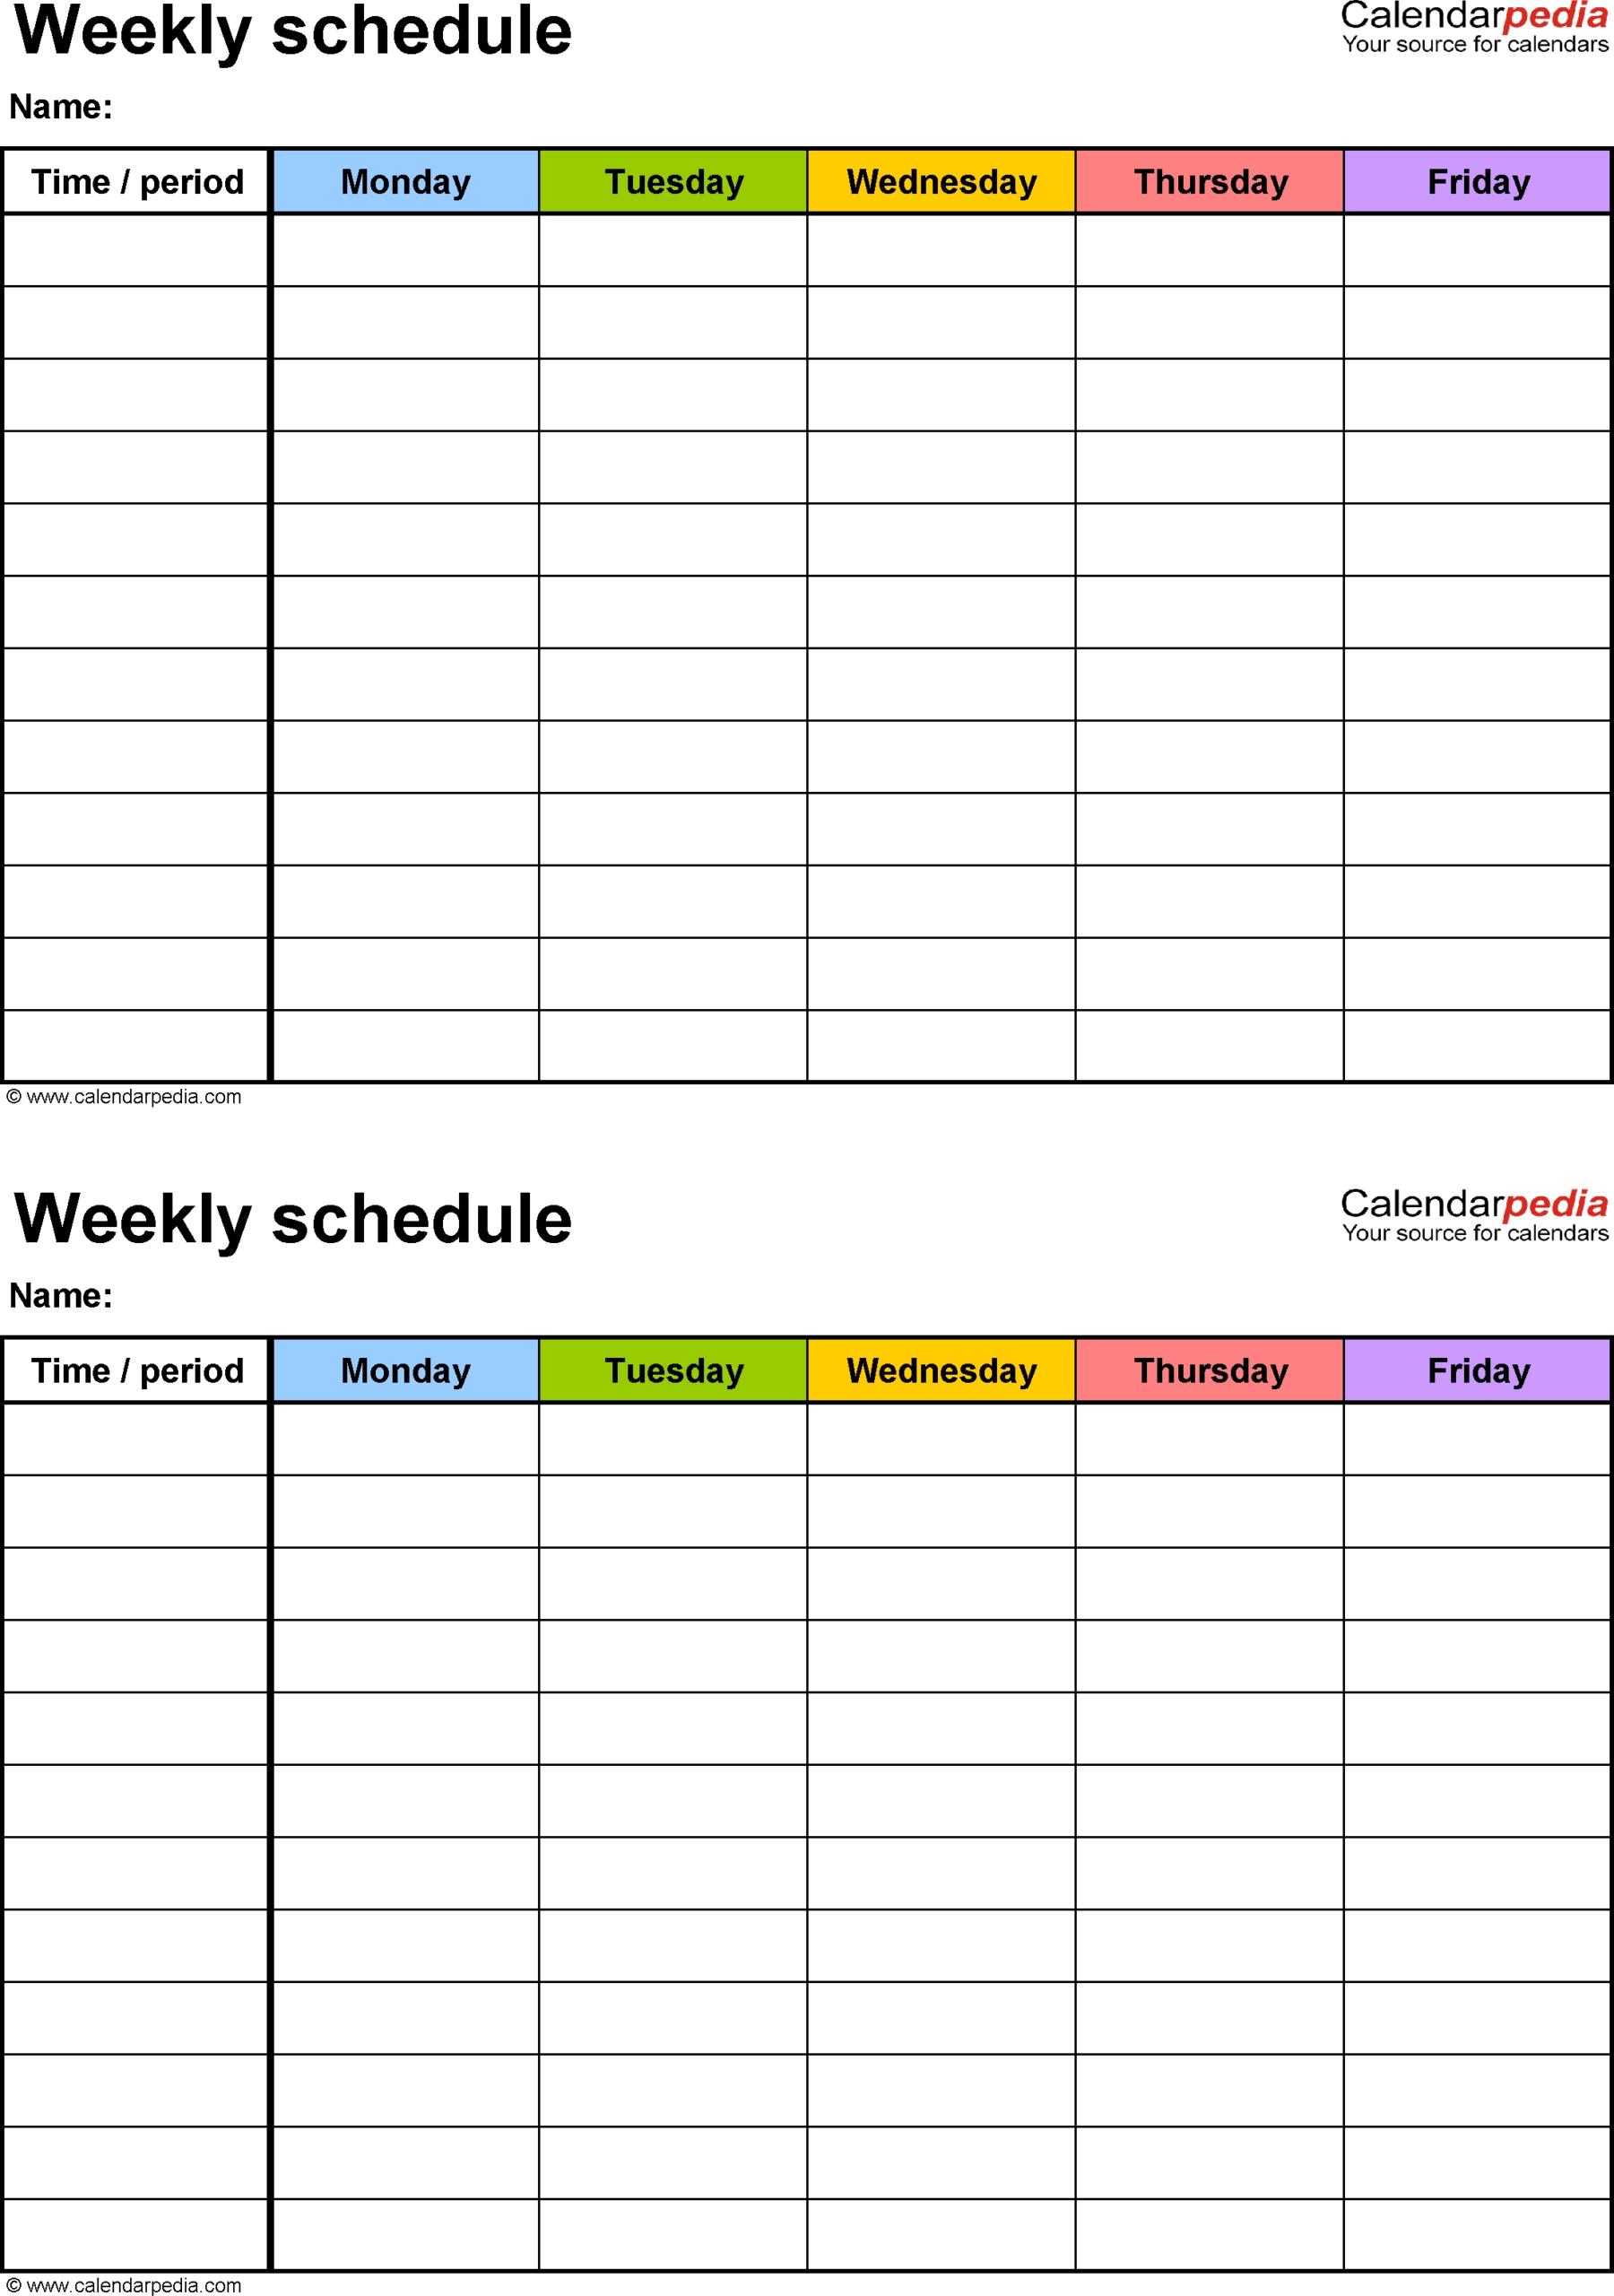 Downloadable Monday Thru Friday Calendar Template for Free Monday Through Friday Calendar Template